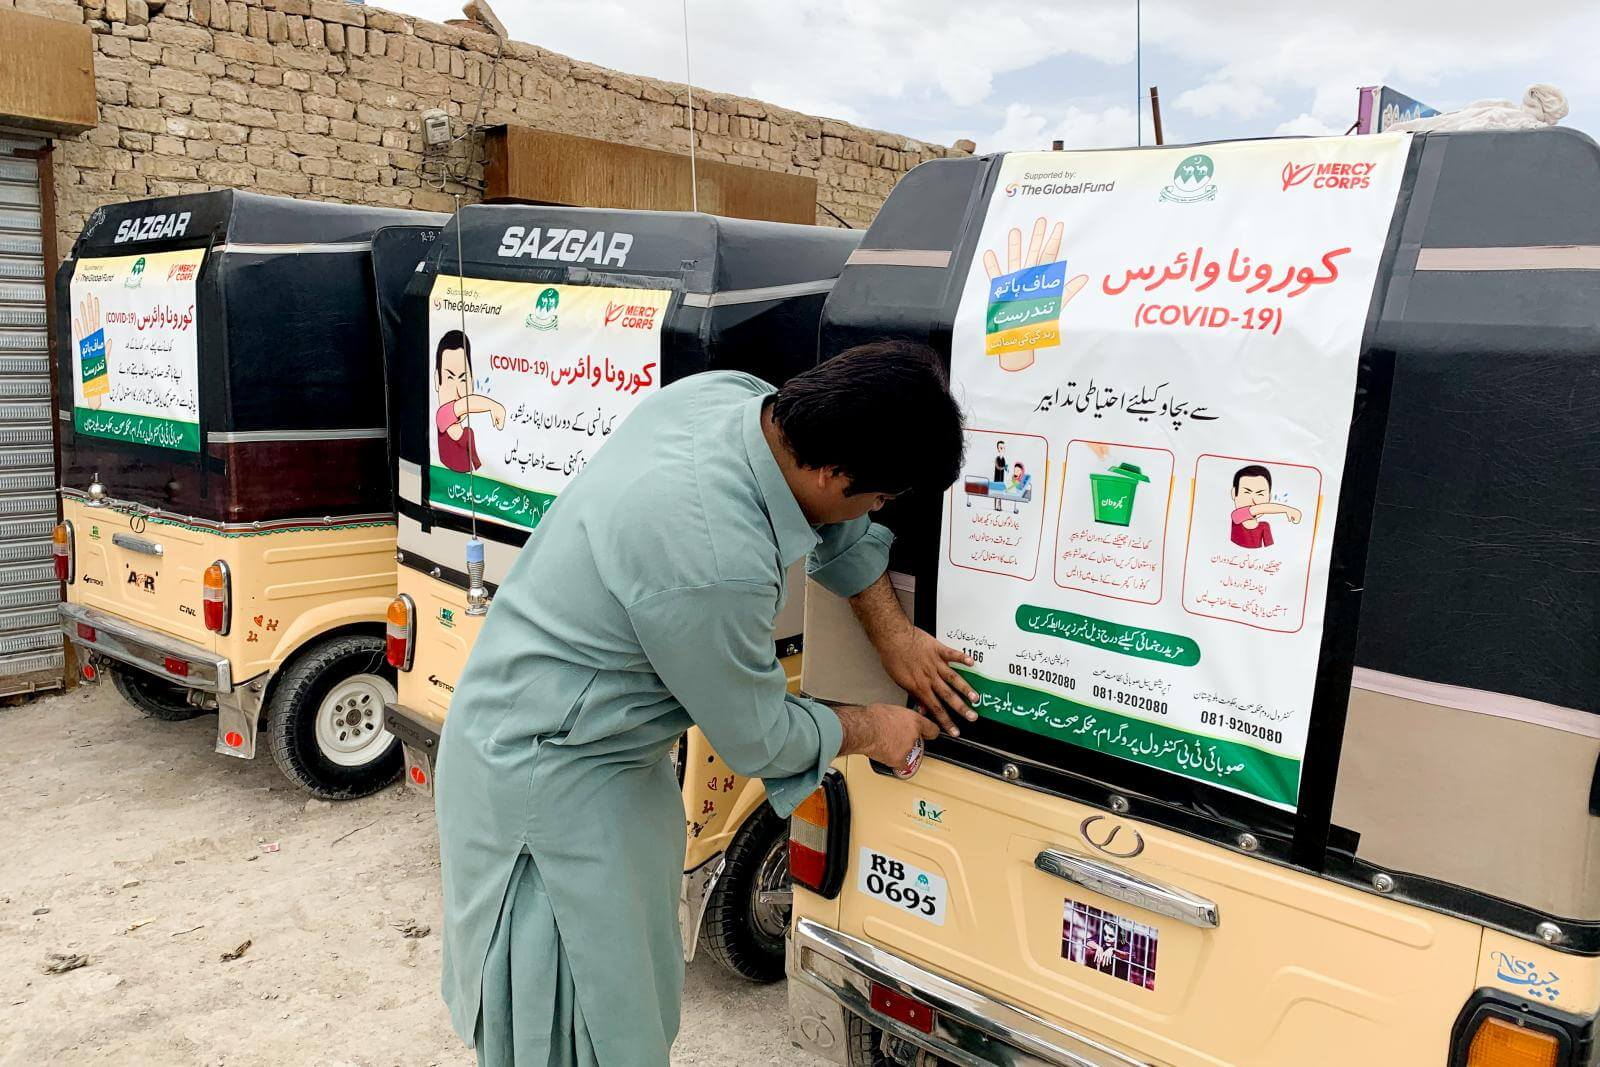 Mercy Corps usa tuk tuks (similares a las mototaxis) para mostrar y compartir guías para reducir la propagación de COVID-19 en Pakistán